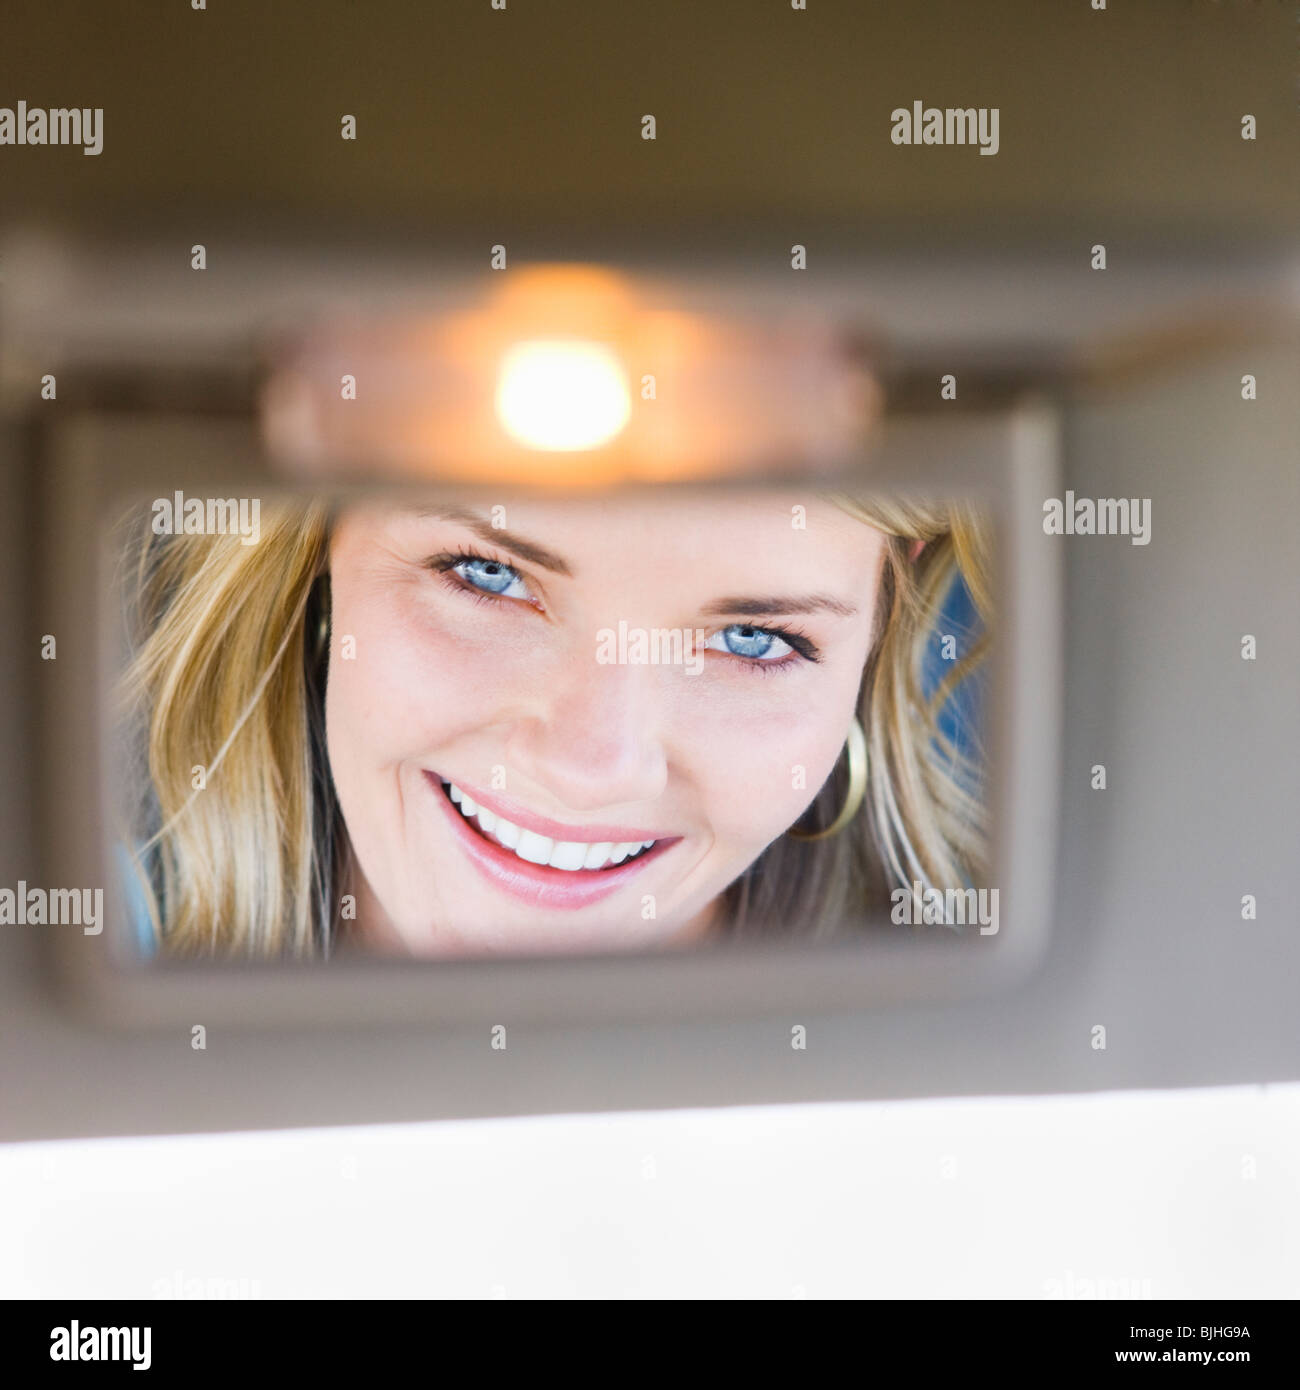 woman looking in visor mirror in car - Stock Image